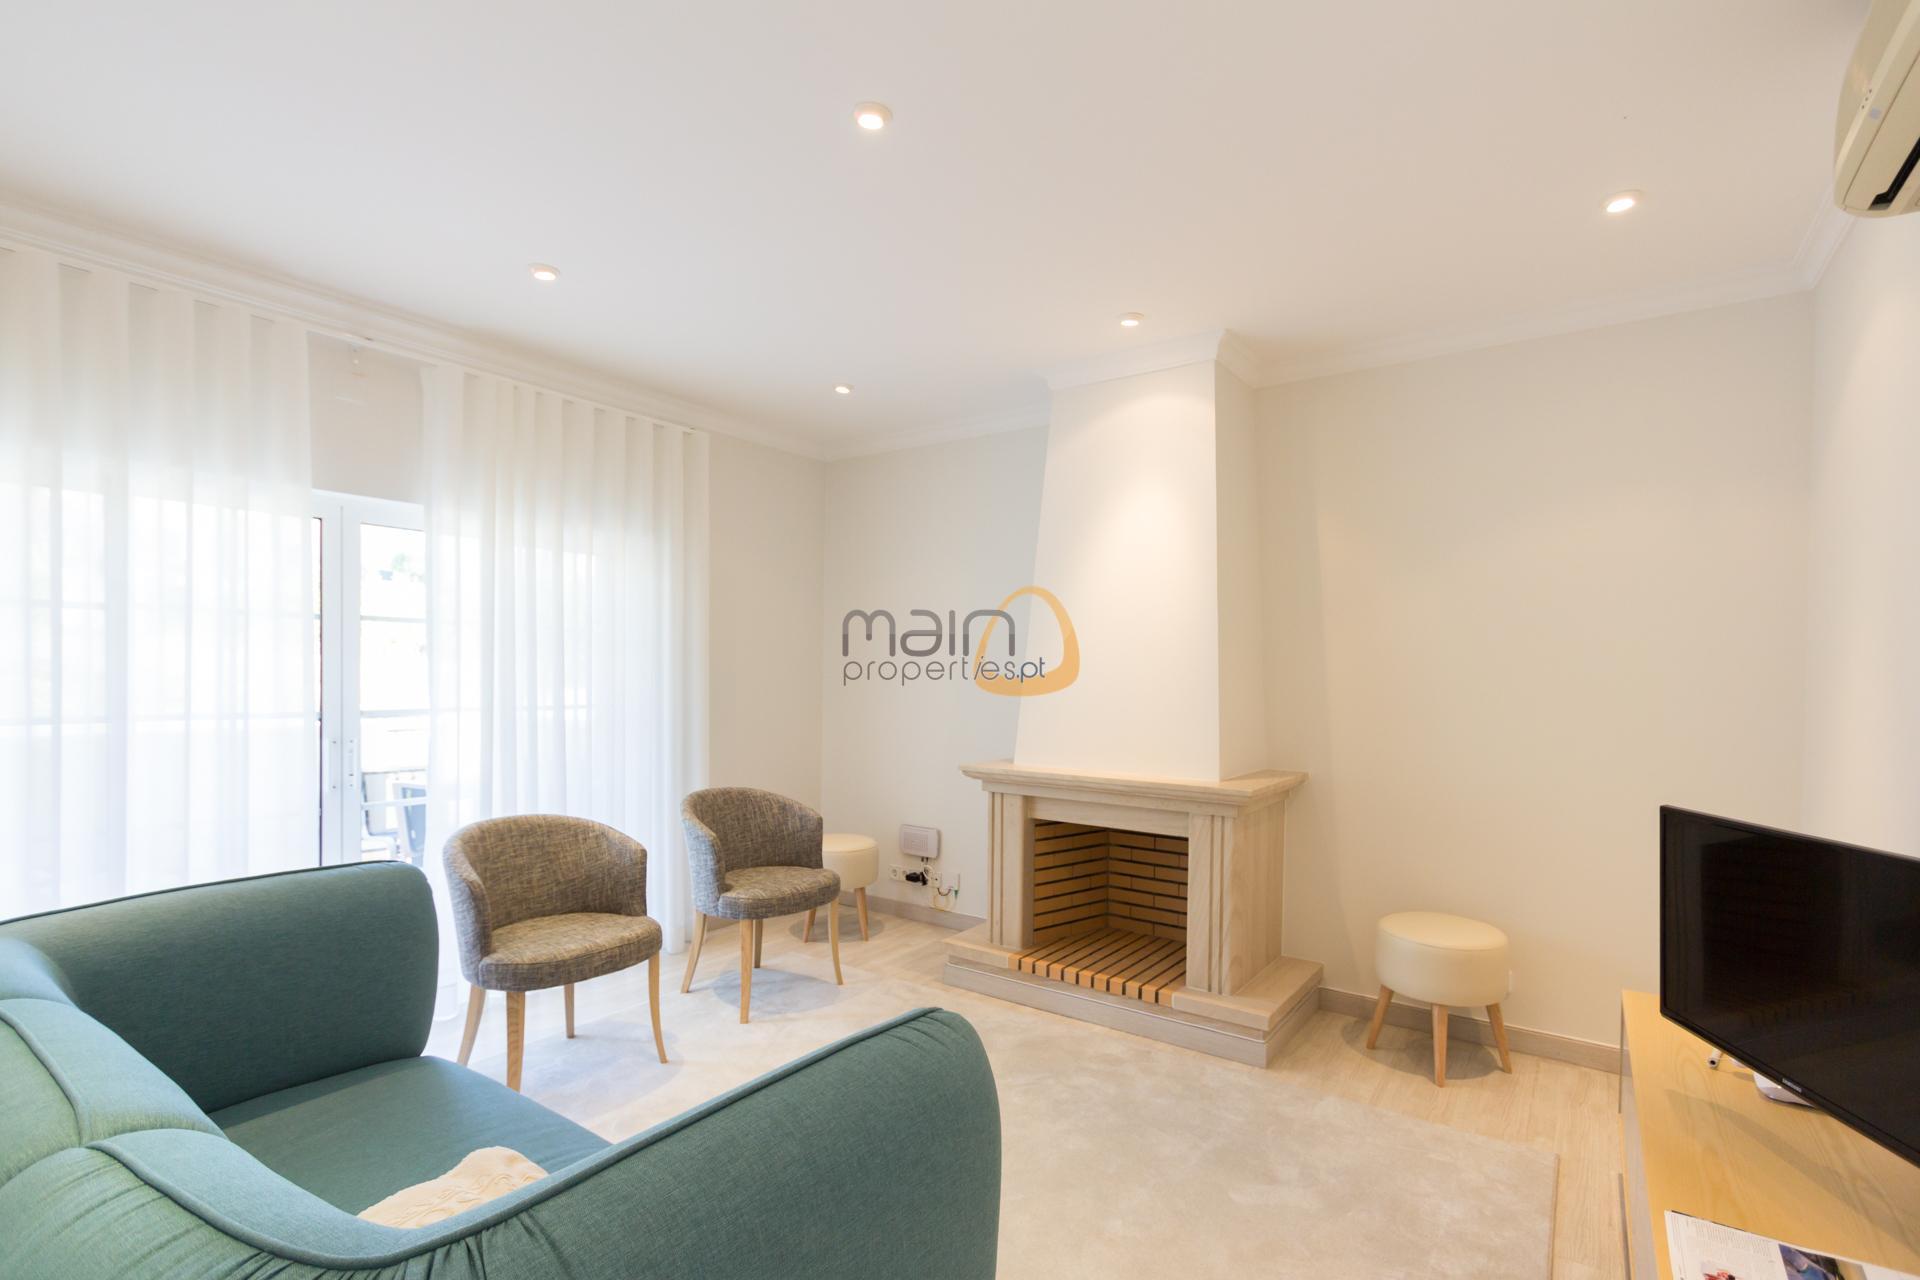 apartment-in-vale-do-lobo-algarve-golden-triangle-portugal-property-real-estate-mainproperties-mp134vdl-2